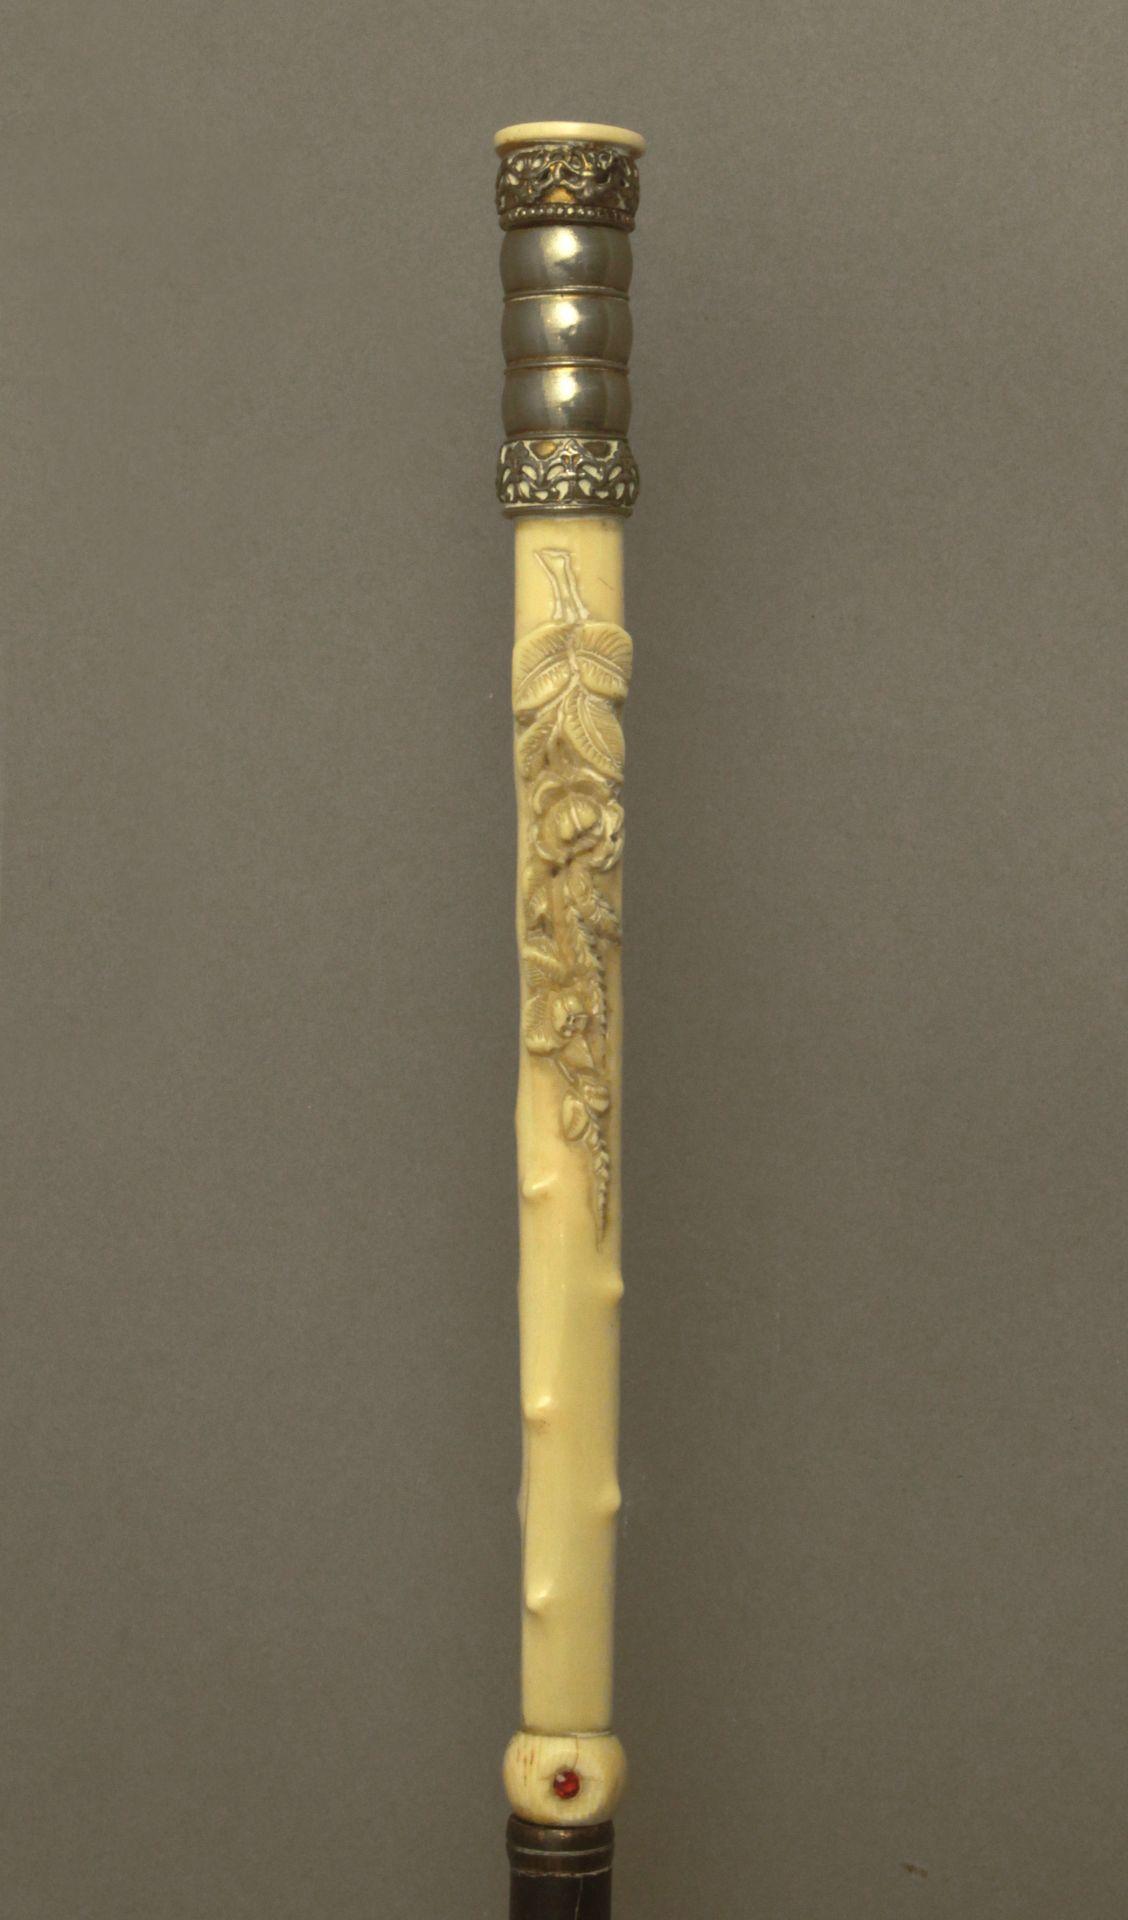 An ivory handled walking stick circa 1900